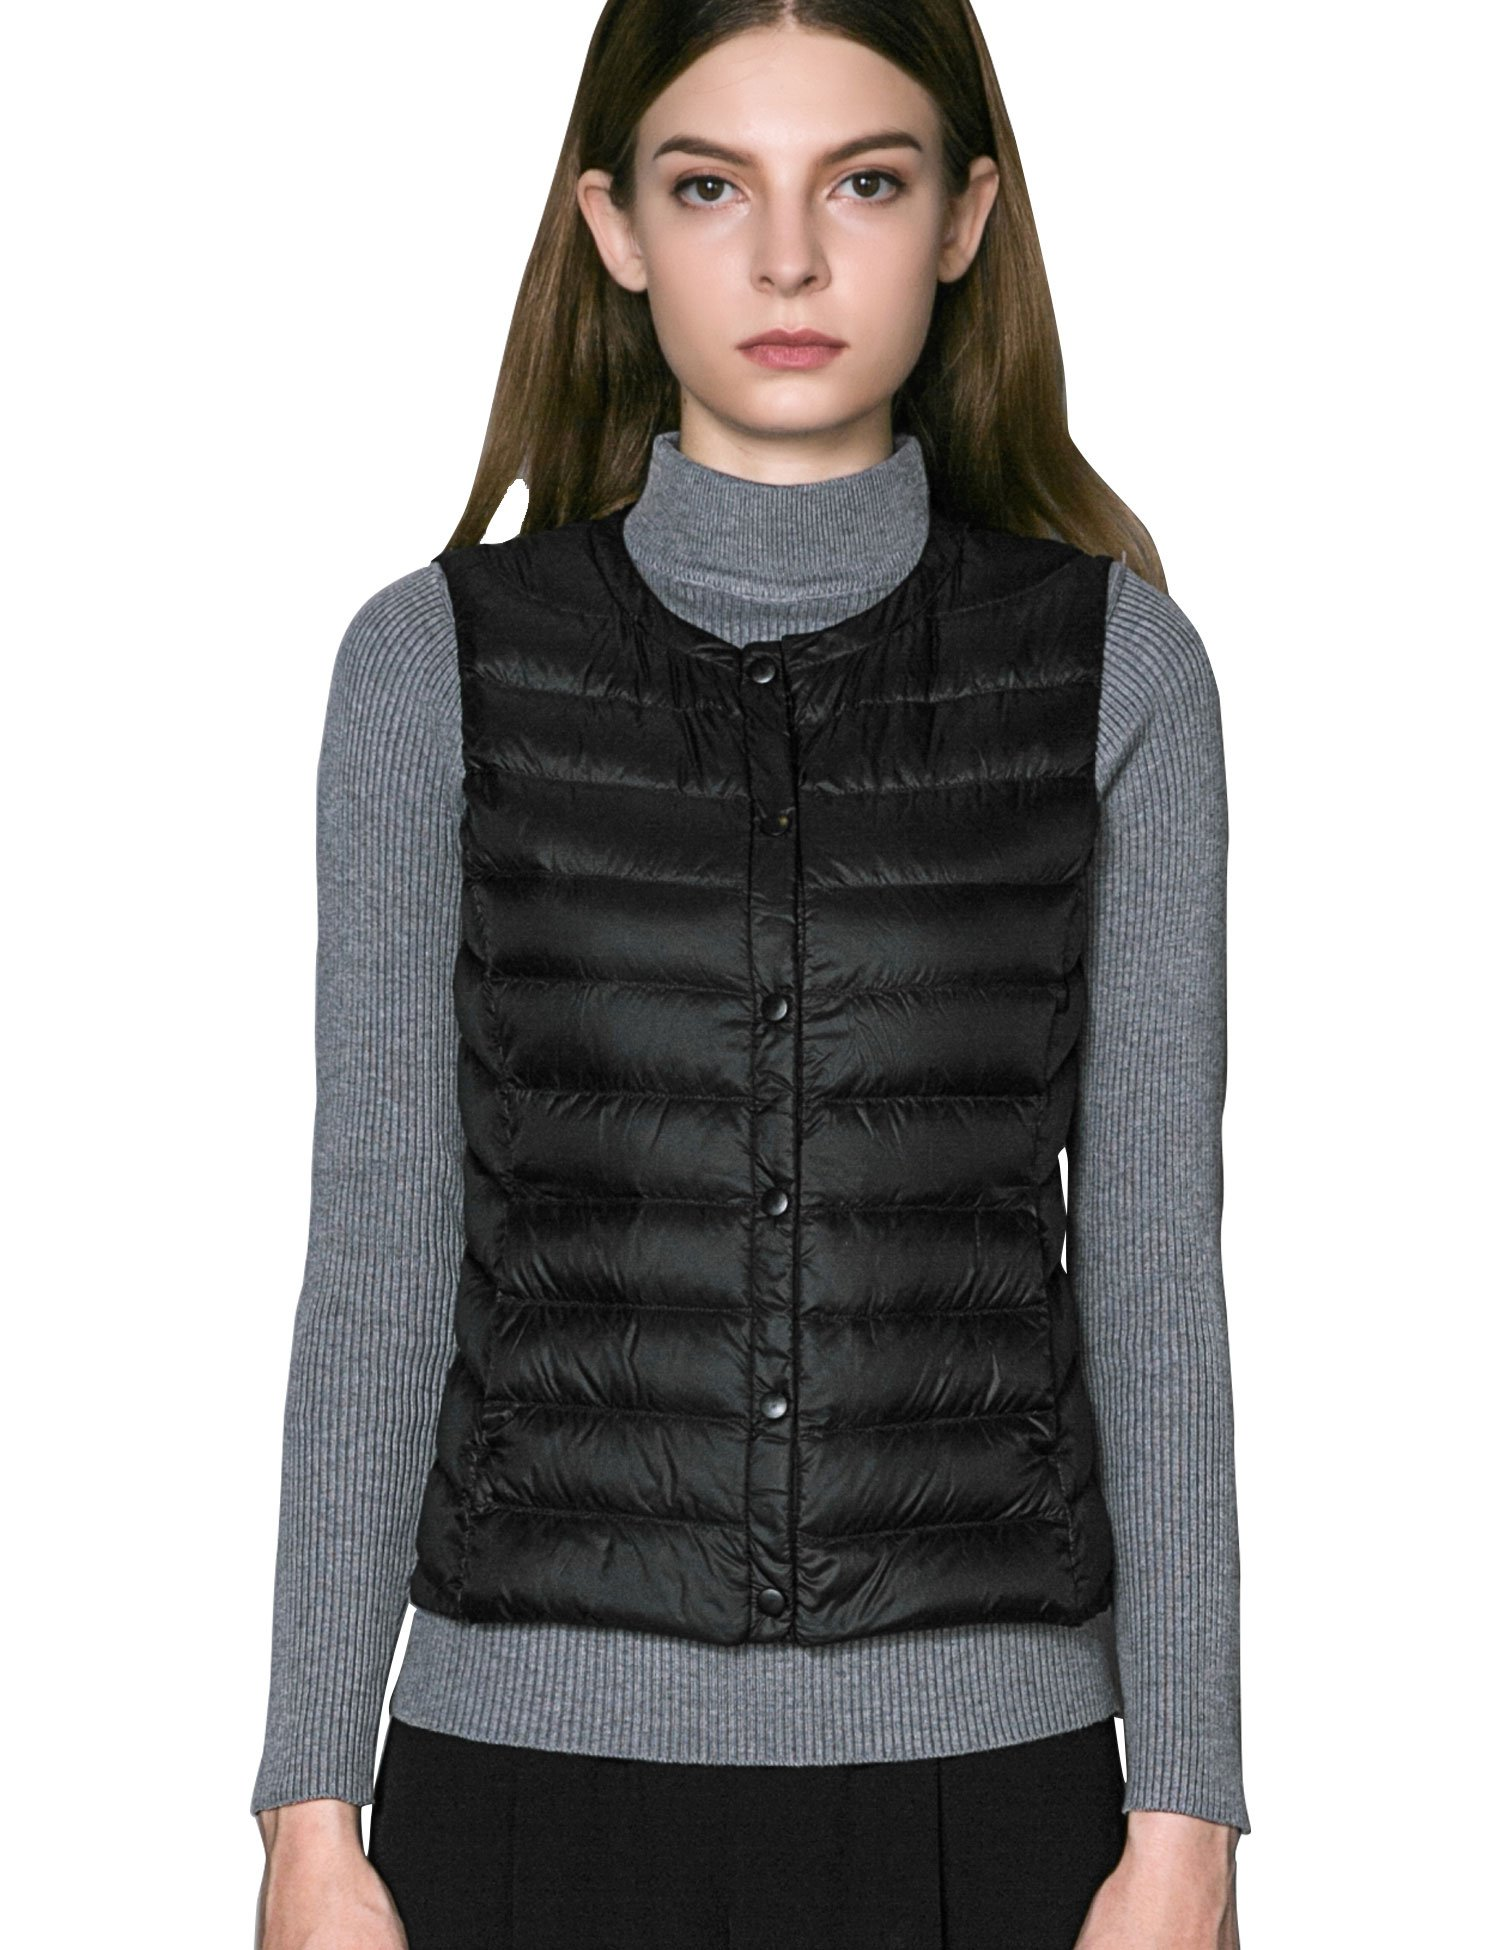 CHERRY CHICK Women's Ultralight Down Spring Vest (XL, Matt Black)